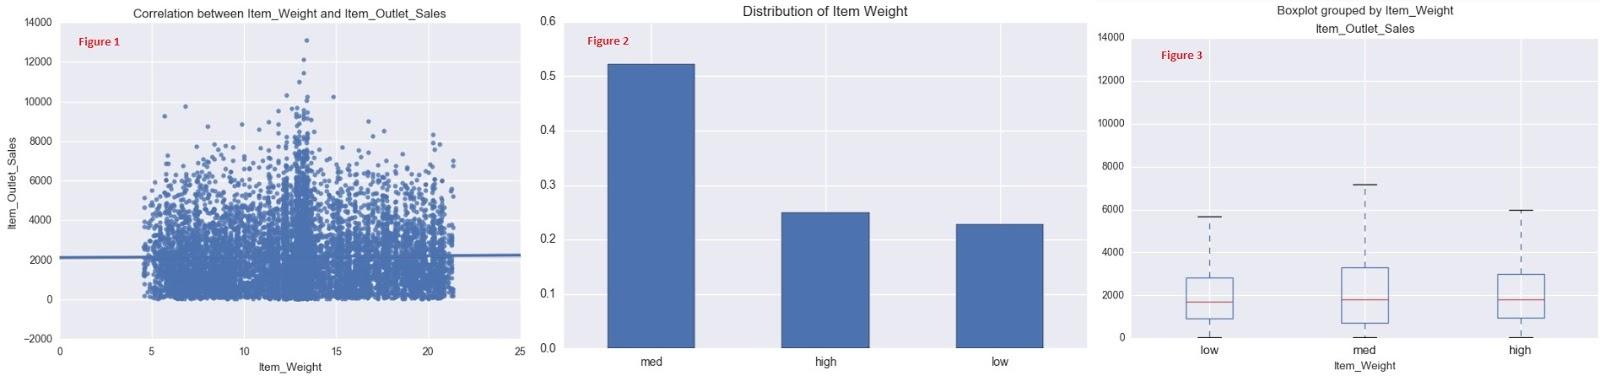 Exploratory Data Analysis and Hypothesis Testing - Big Mart